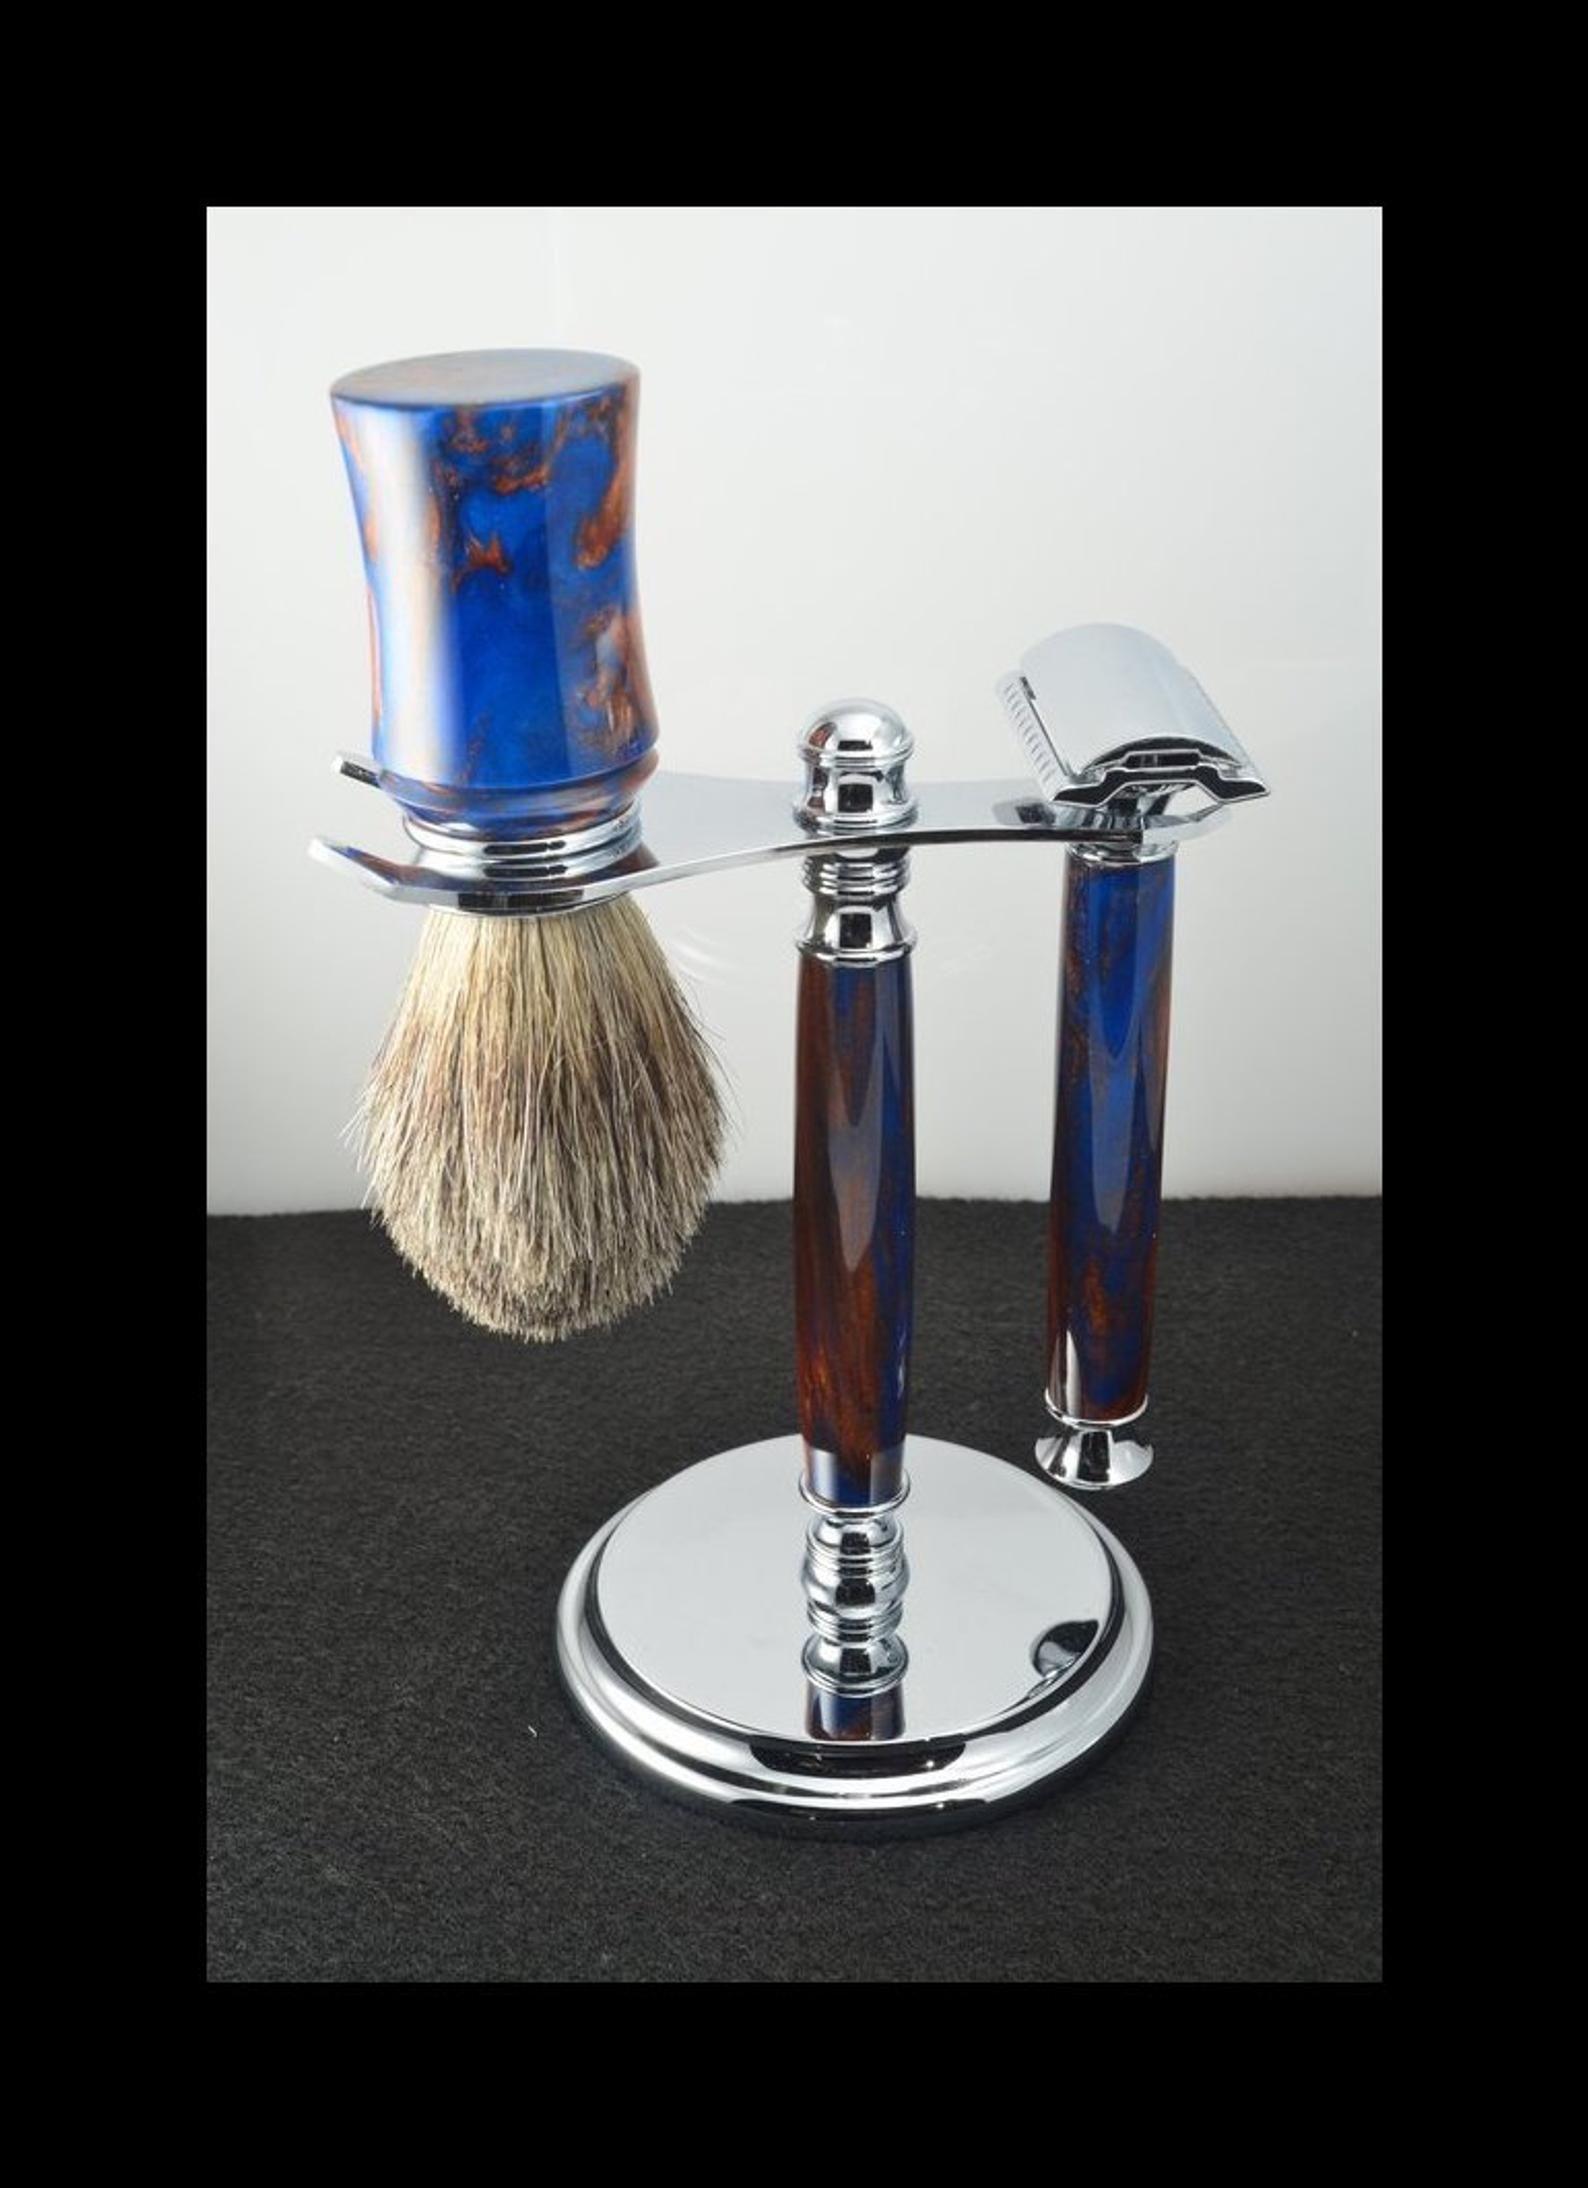 Shaving Set Shaving Kit Safety Razor Shave Brush Men's